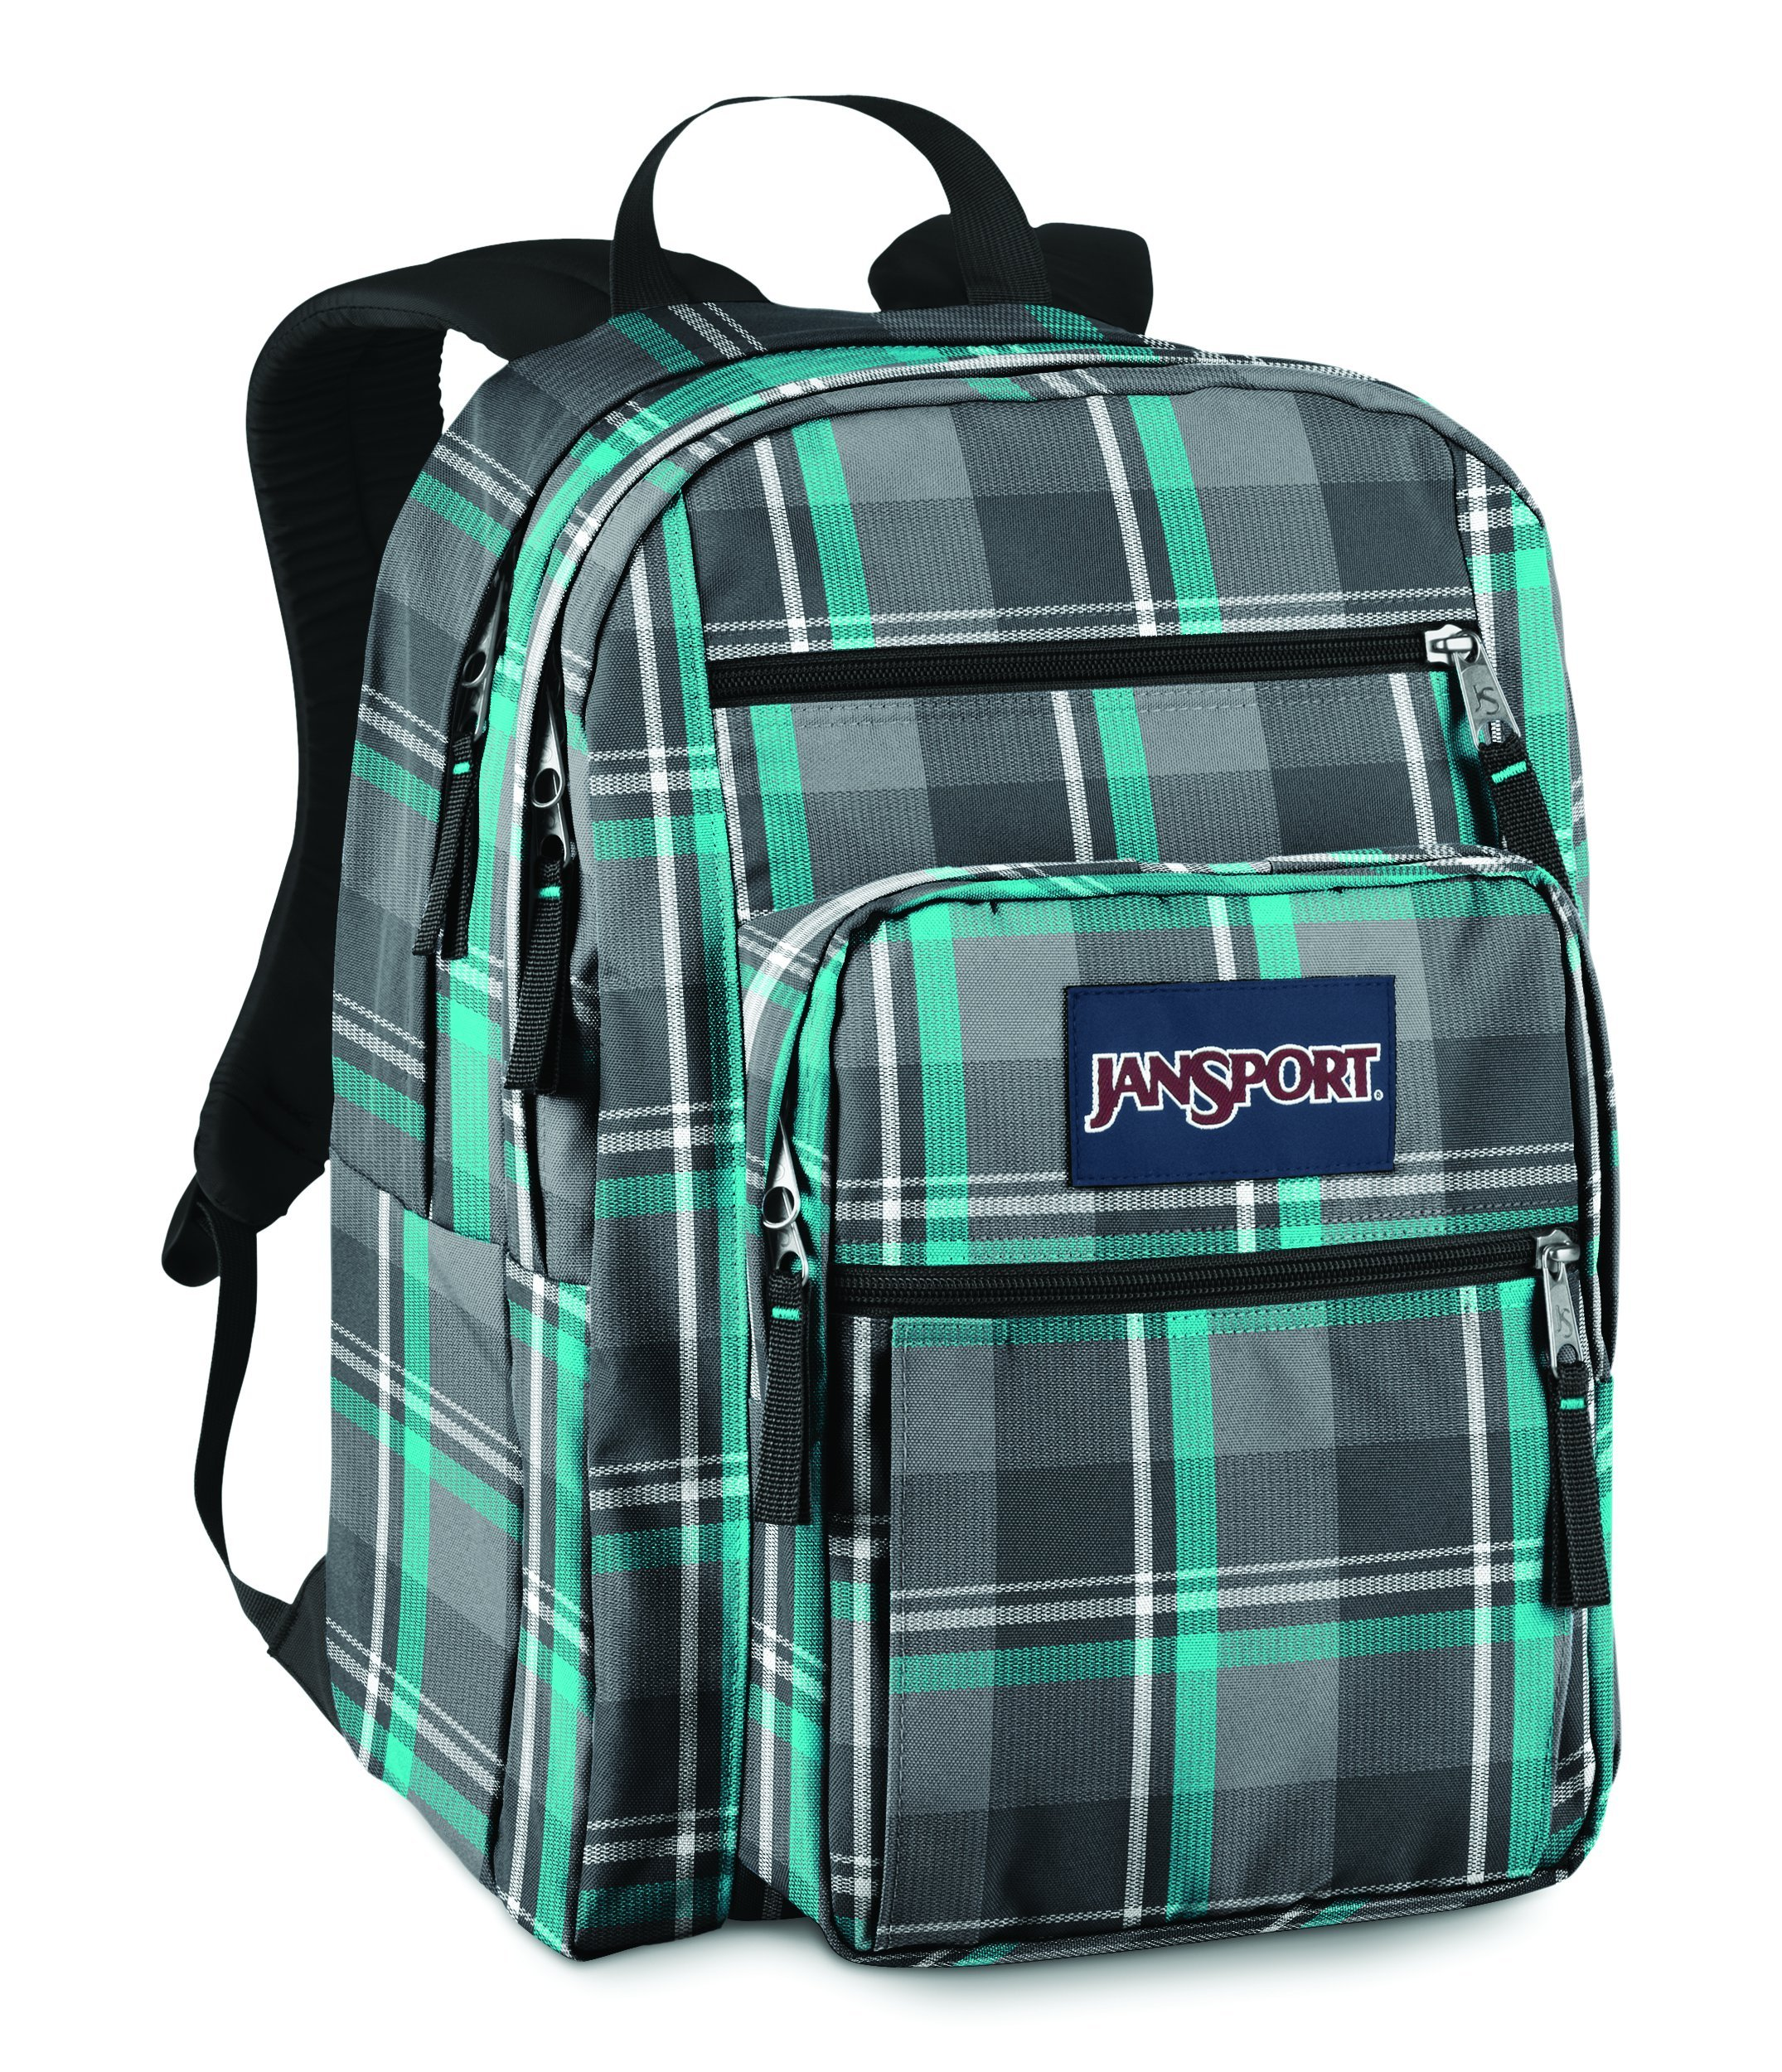 Galleon - JanSport Classics Series Big Student Backpack ...